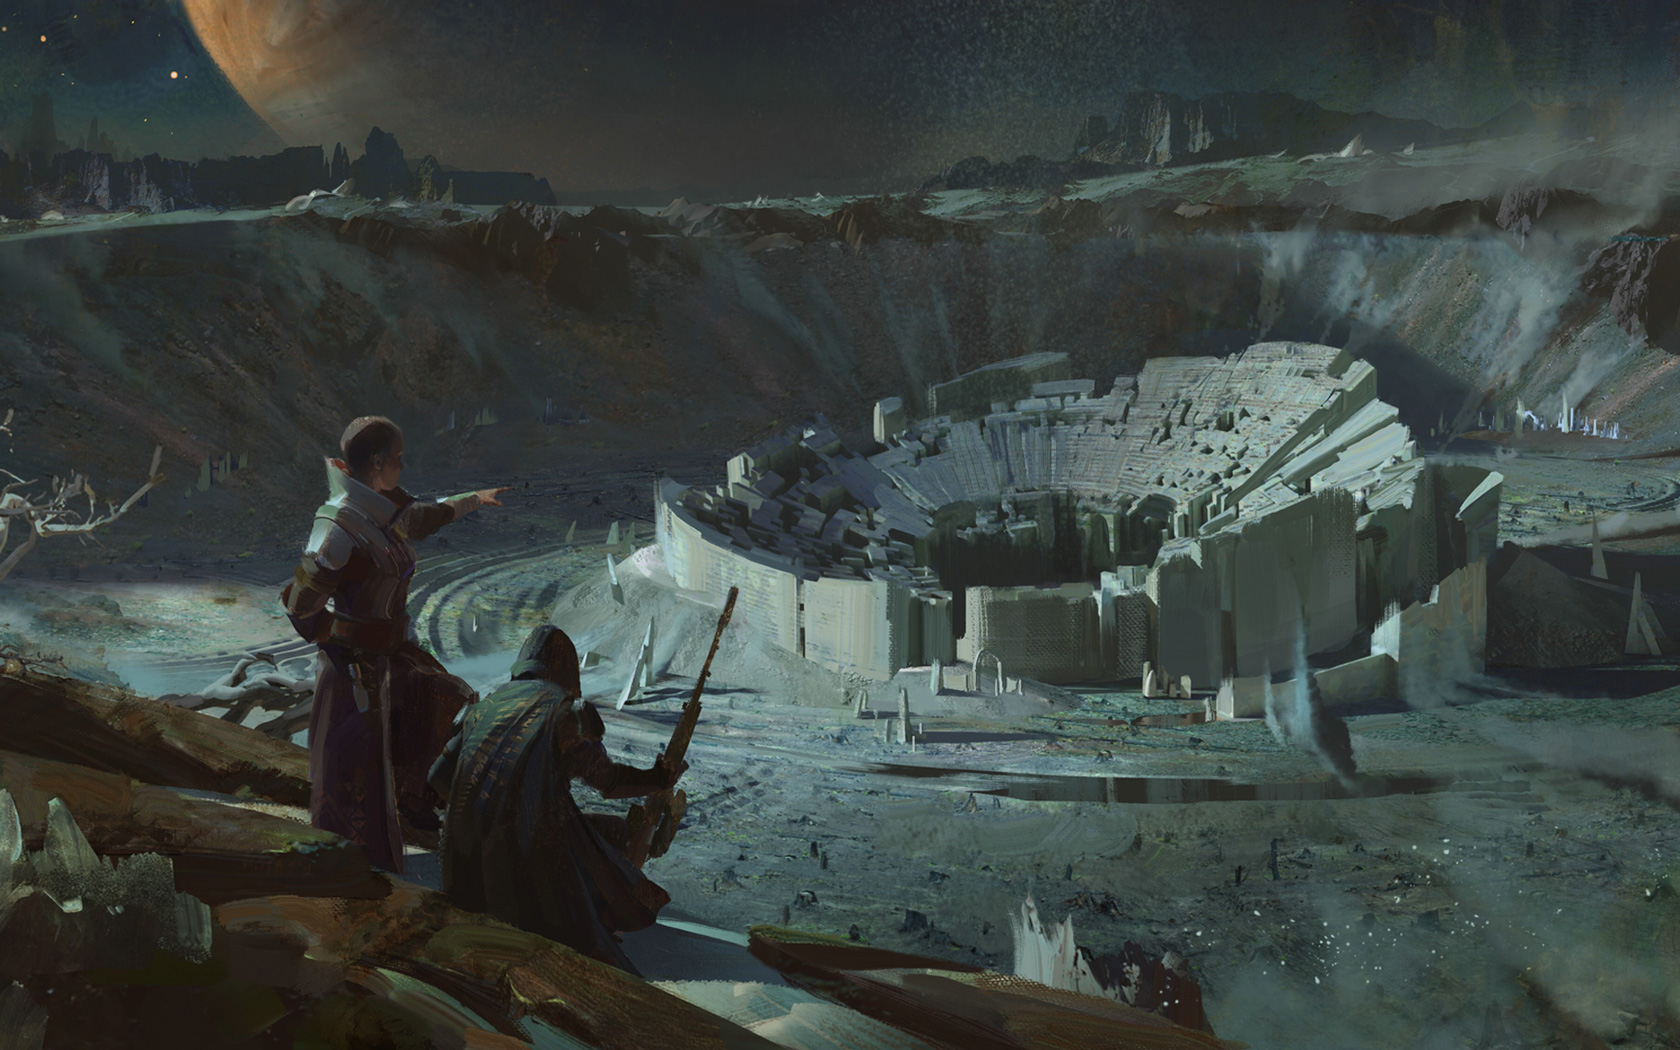 Destiny 2 Wallpaper in 1680x1050